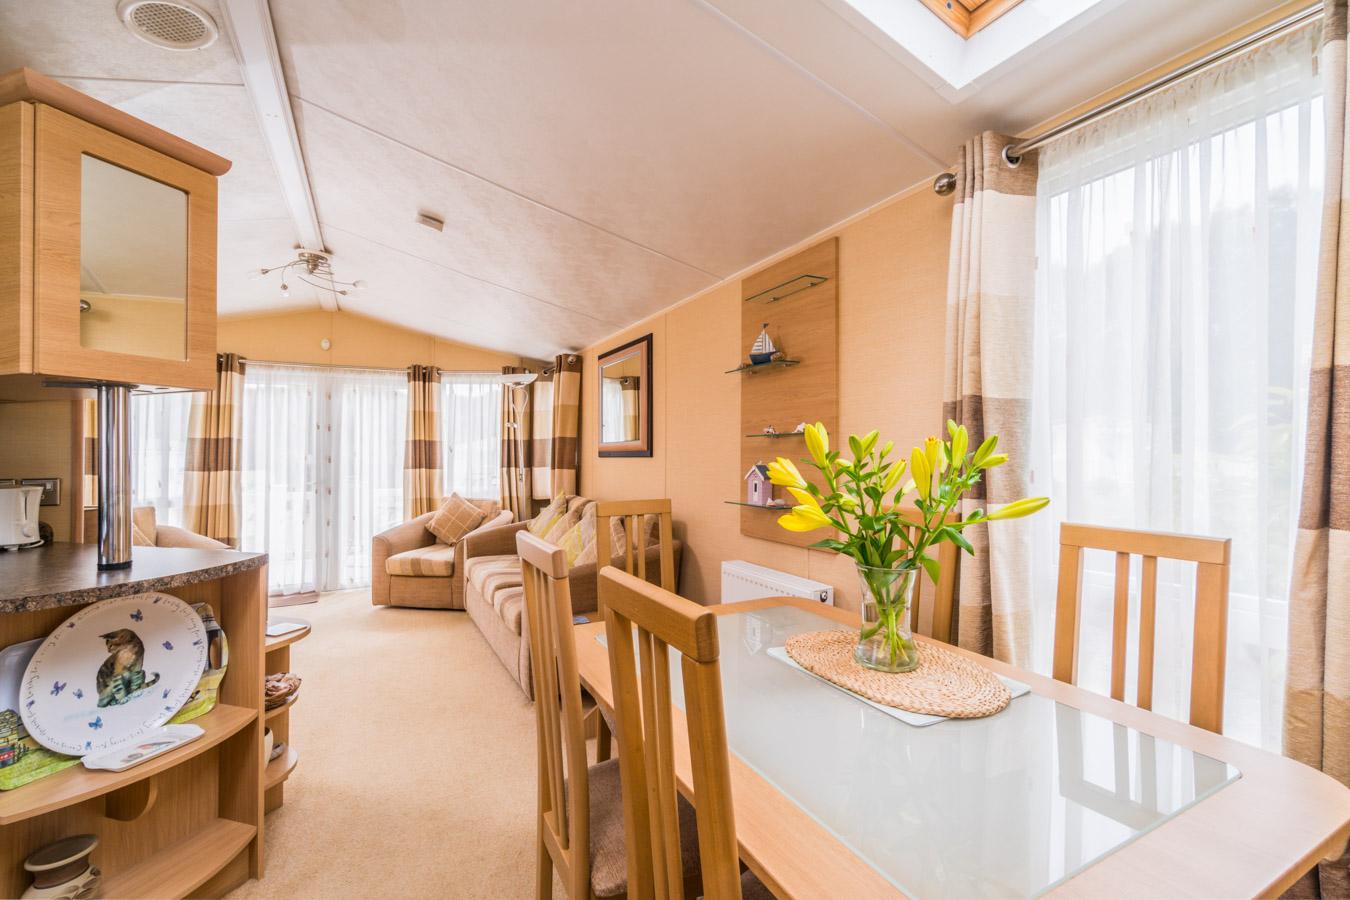 Neil-Bigwood-Monkton-Wyld-Holiday-Homes-25